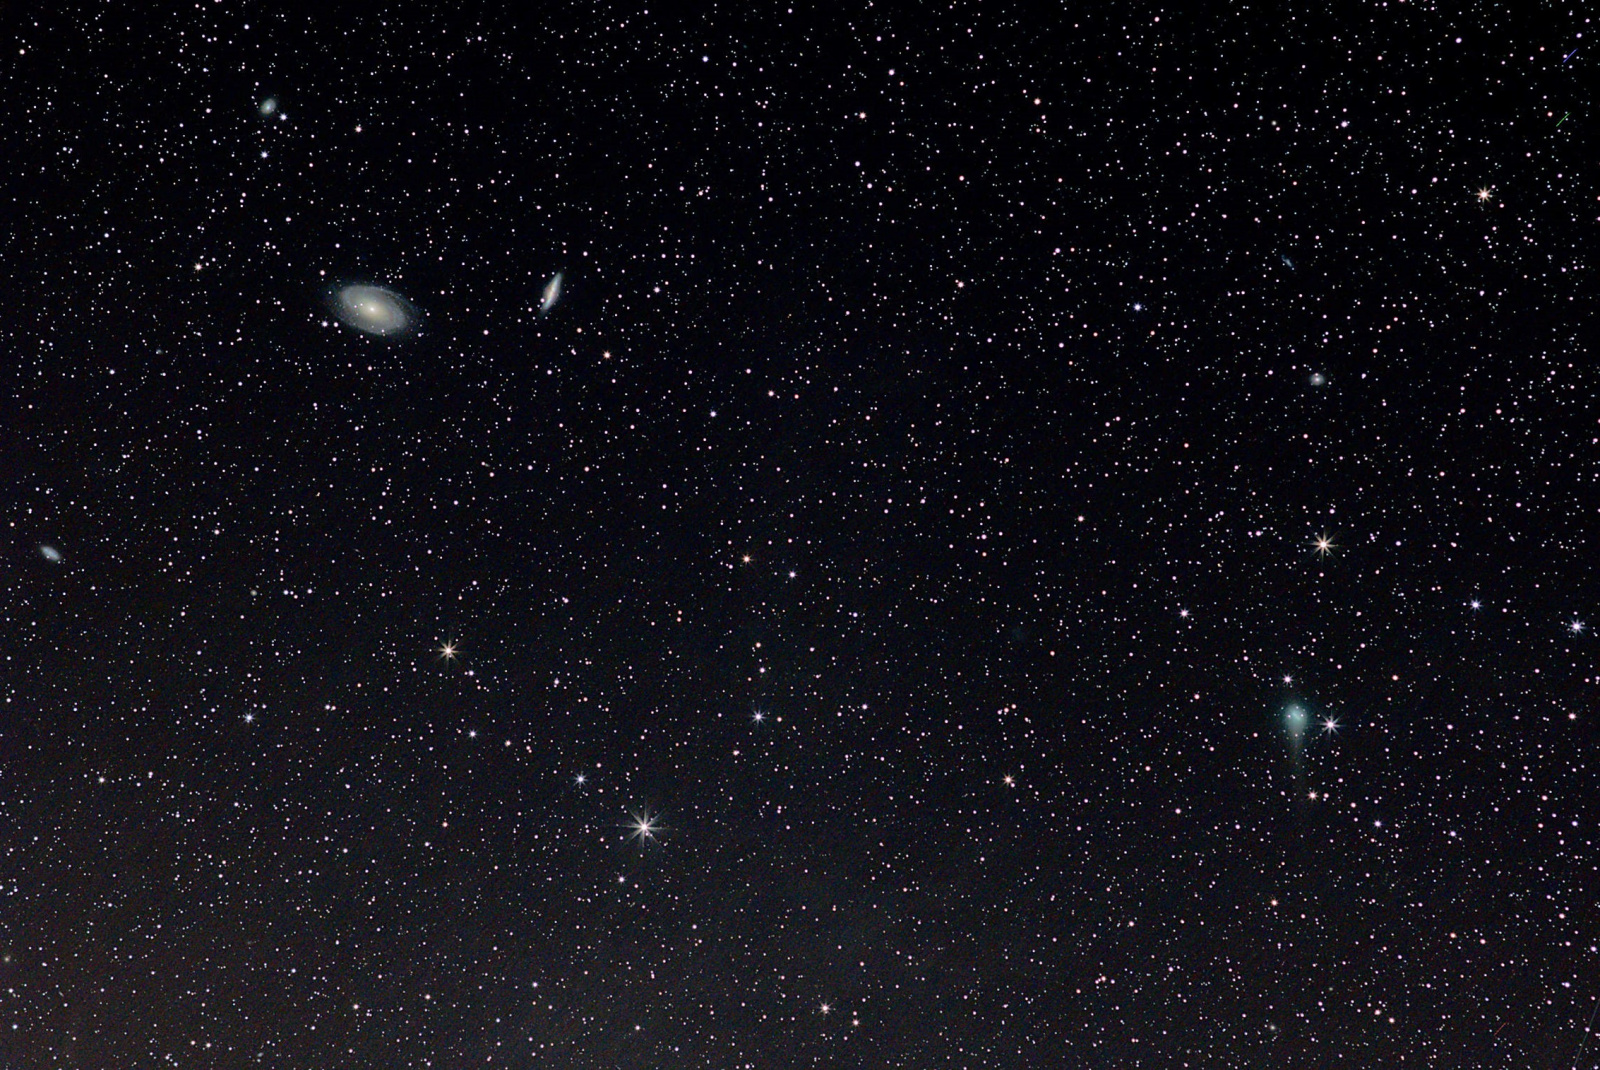 Kometa C2017 T2 Panstarrs 20200519 na gwiazdy pop crop.jpg